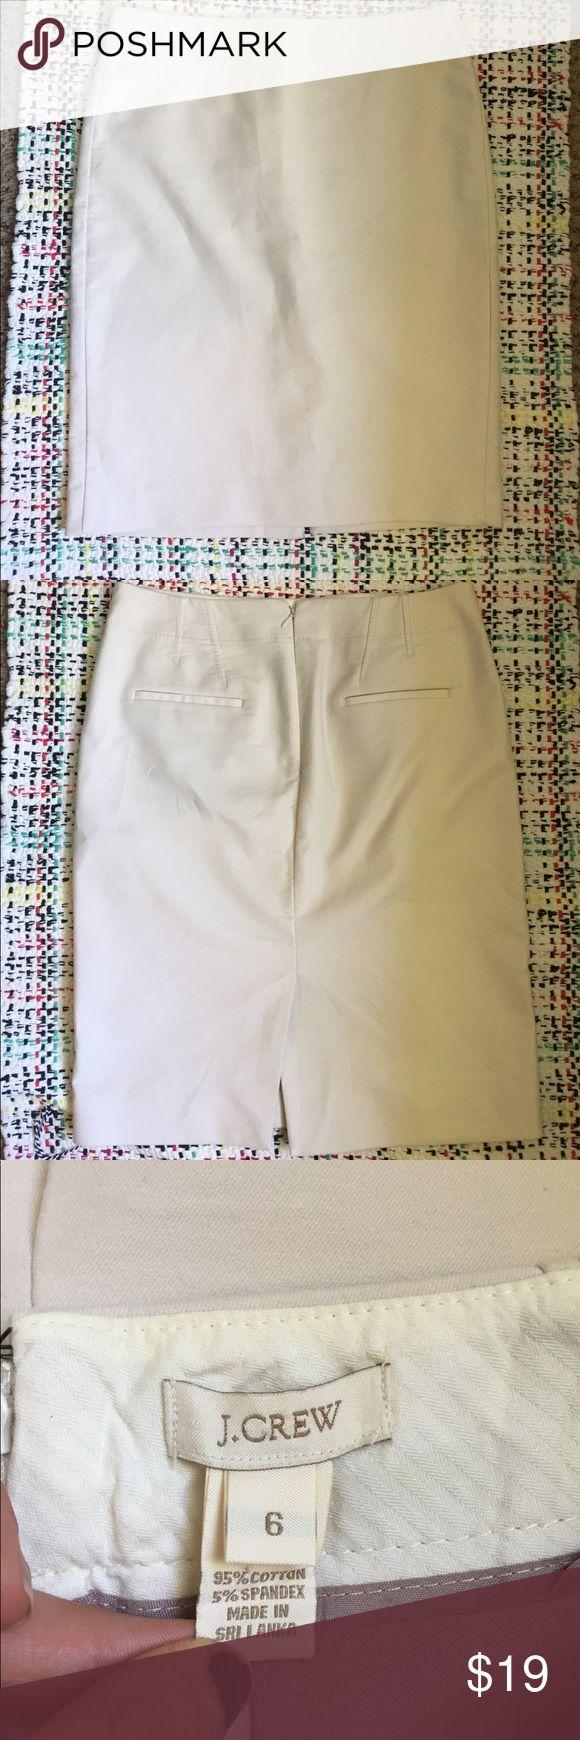 J. Crew beige pencil skirt J. Crew cotton beige pencil skirt. 95% cotton 5% spandex. Size medium. No stains. Skirts